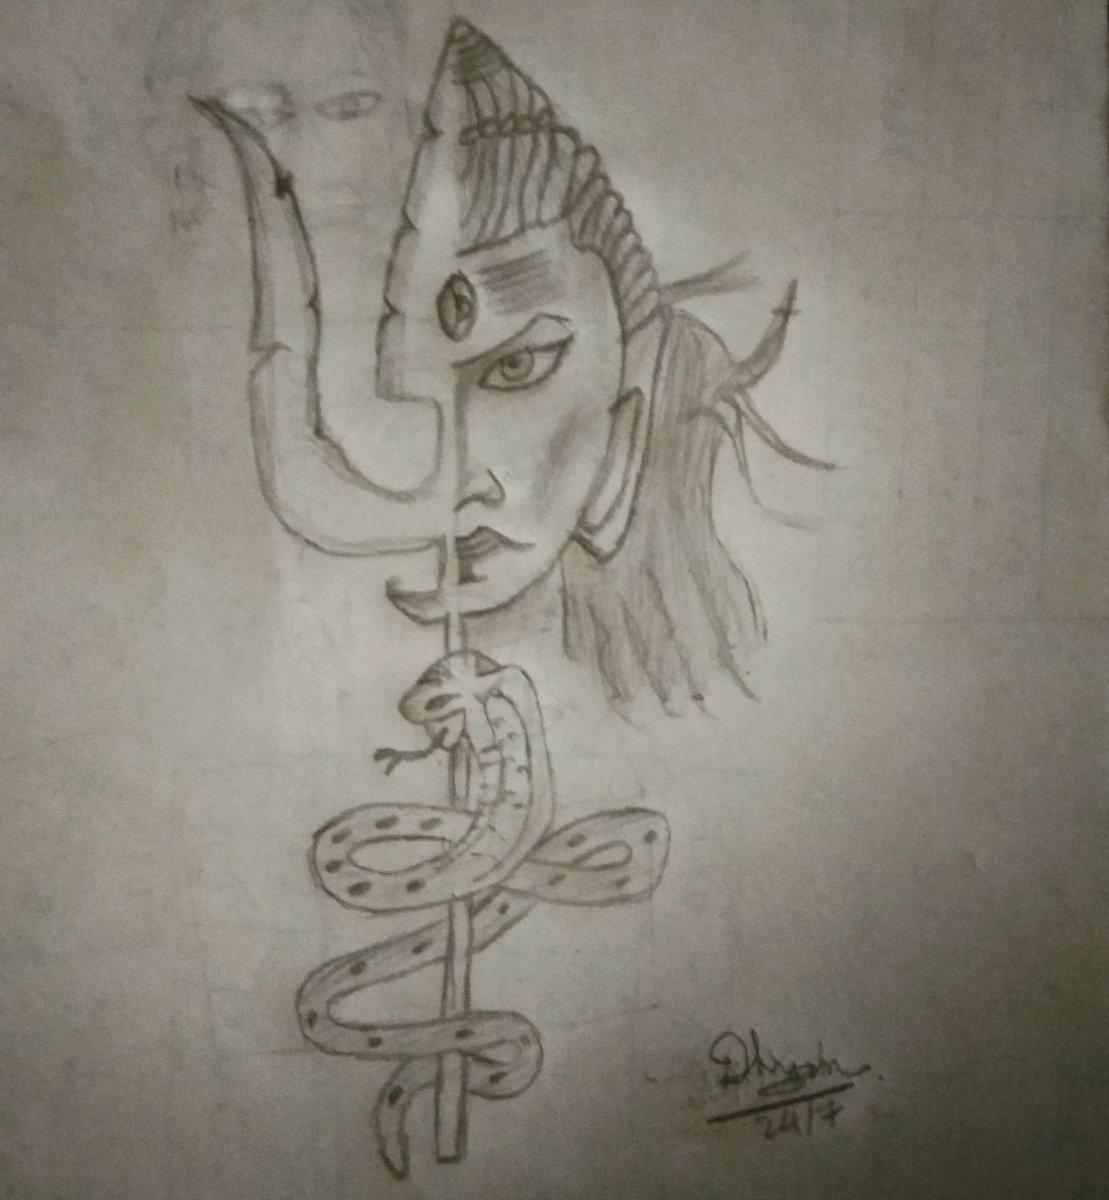 Happy sranvas mas shiva mahadev sketch instaart mood my sketch shankar shambhu lordshiva trishul nilkanth spiritual mahakalpic twitter com